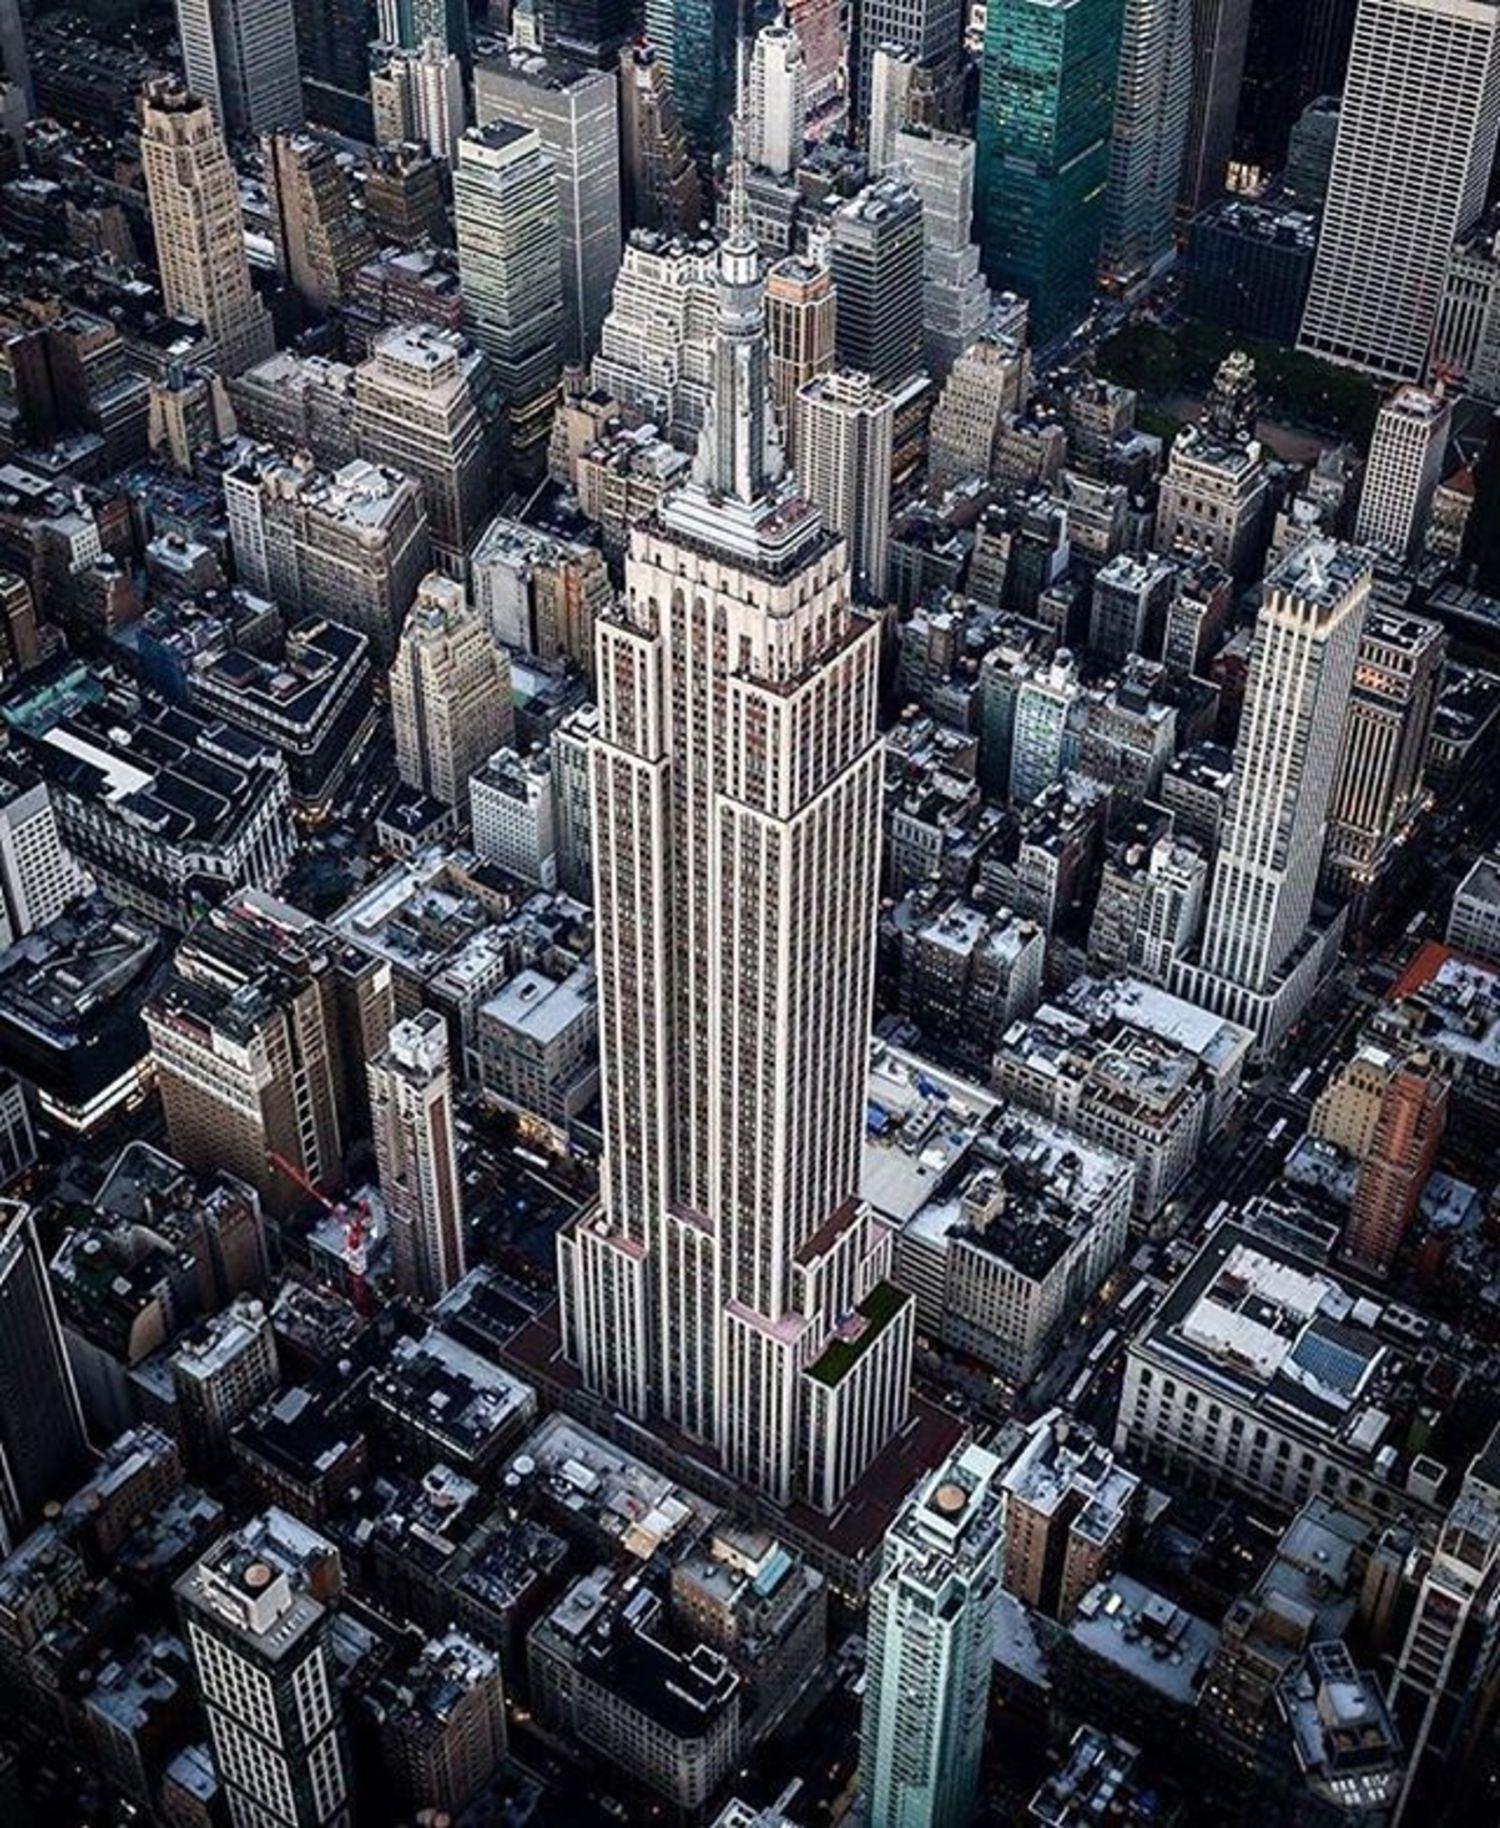 Empire State Building, New York City. Photo via @flynyon #viewingnyc #newyork #newyorkcity #nyc